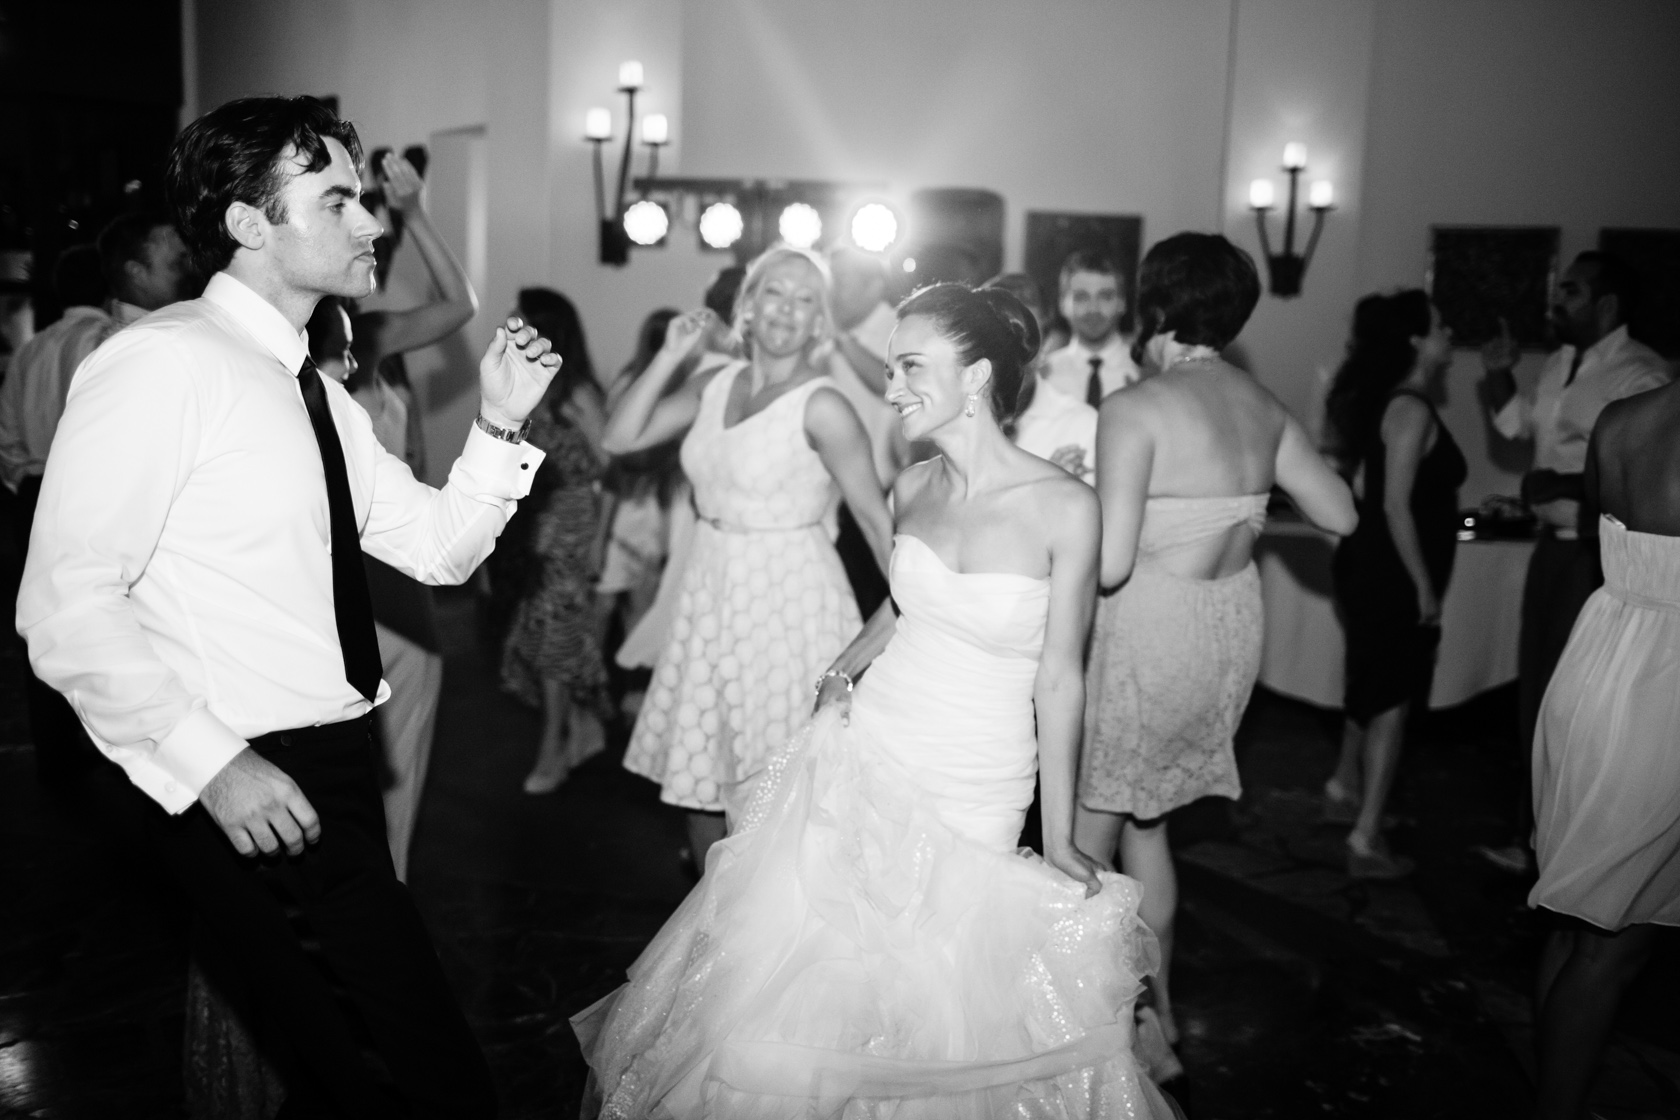 Fairmont_Mayakoba_Wedding_097.jpg